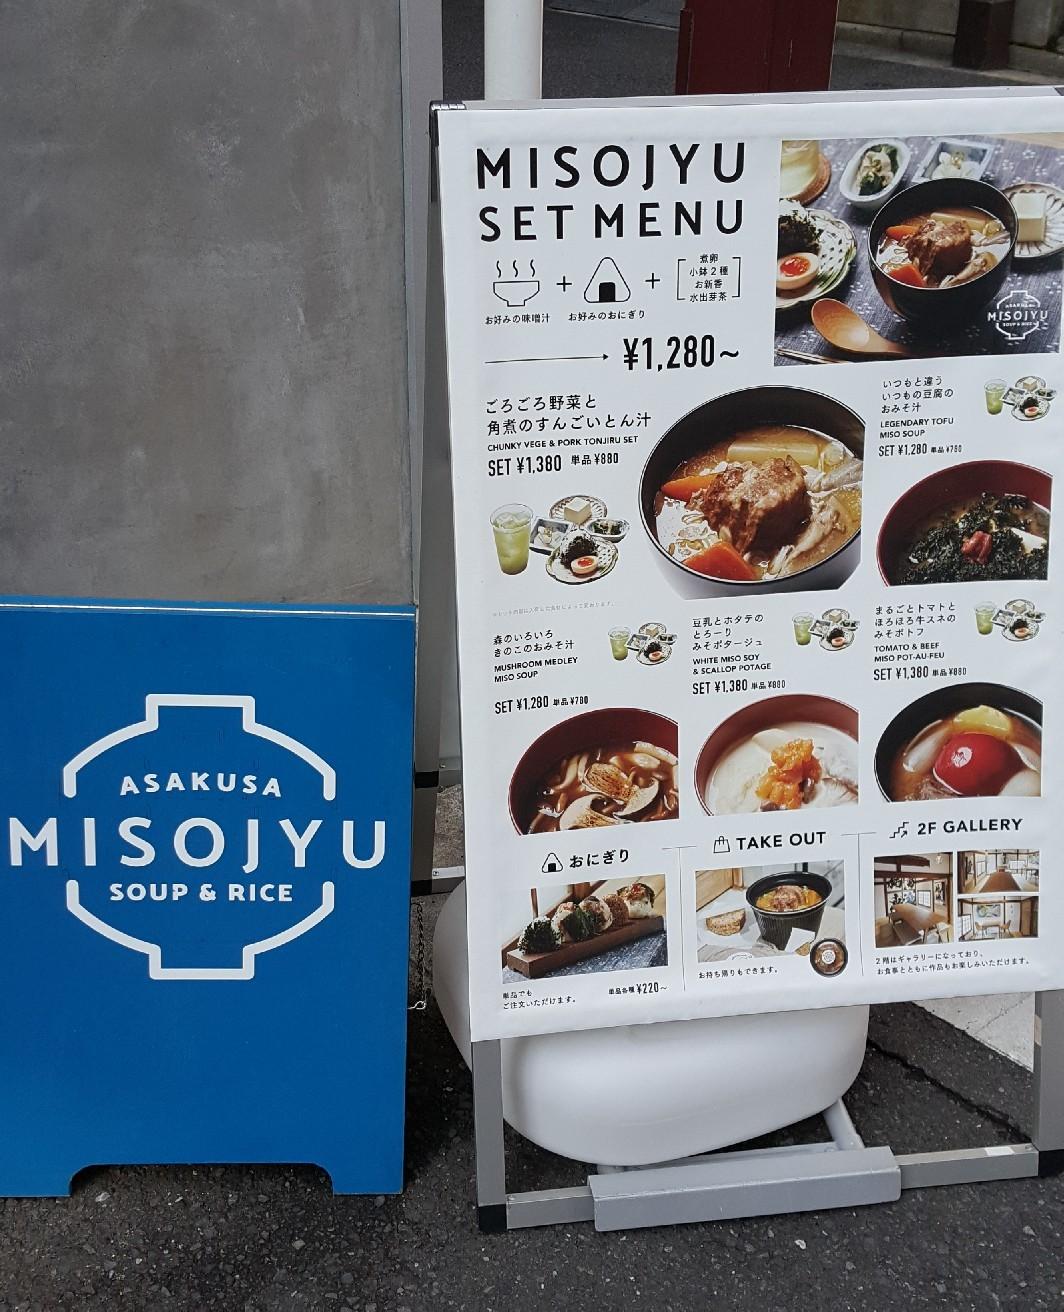 浅草 お味噌汁専門店「MISOJYU」_a0187658_19213822.jpg